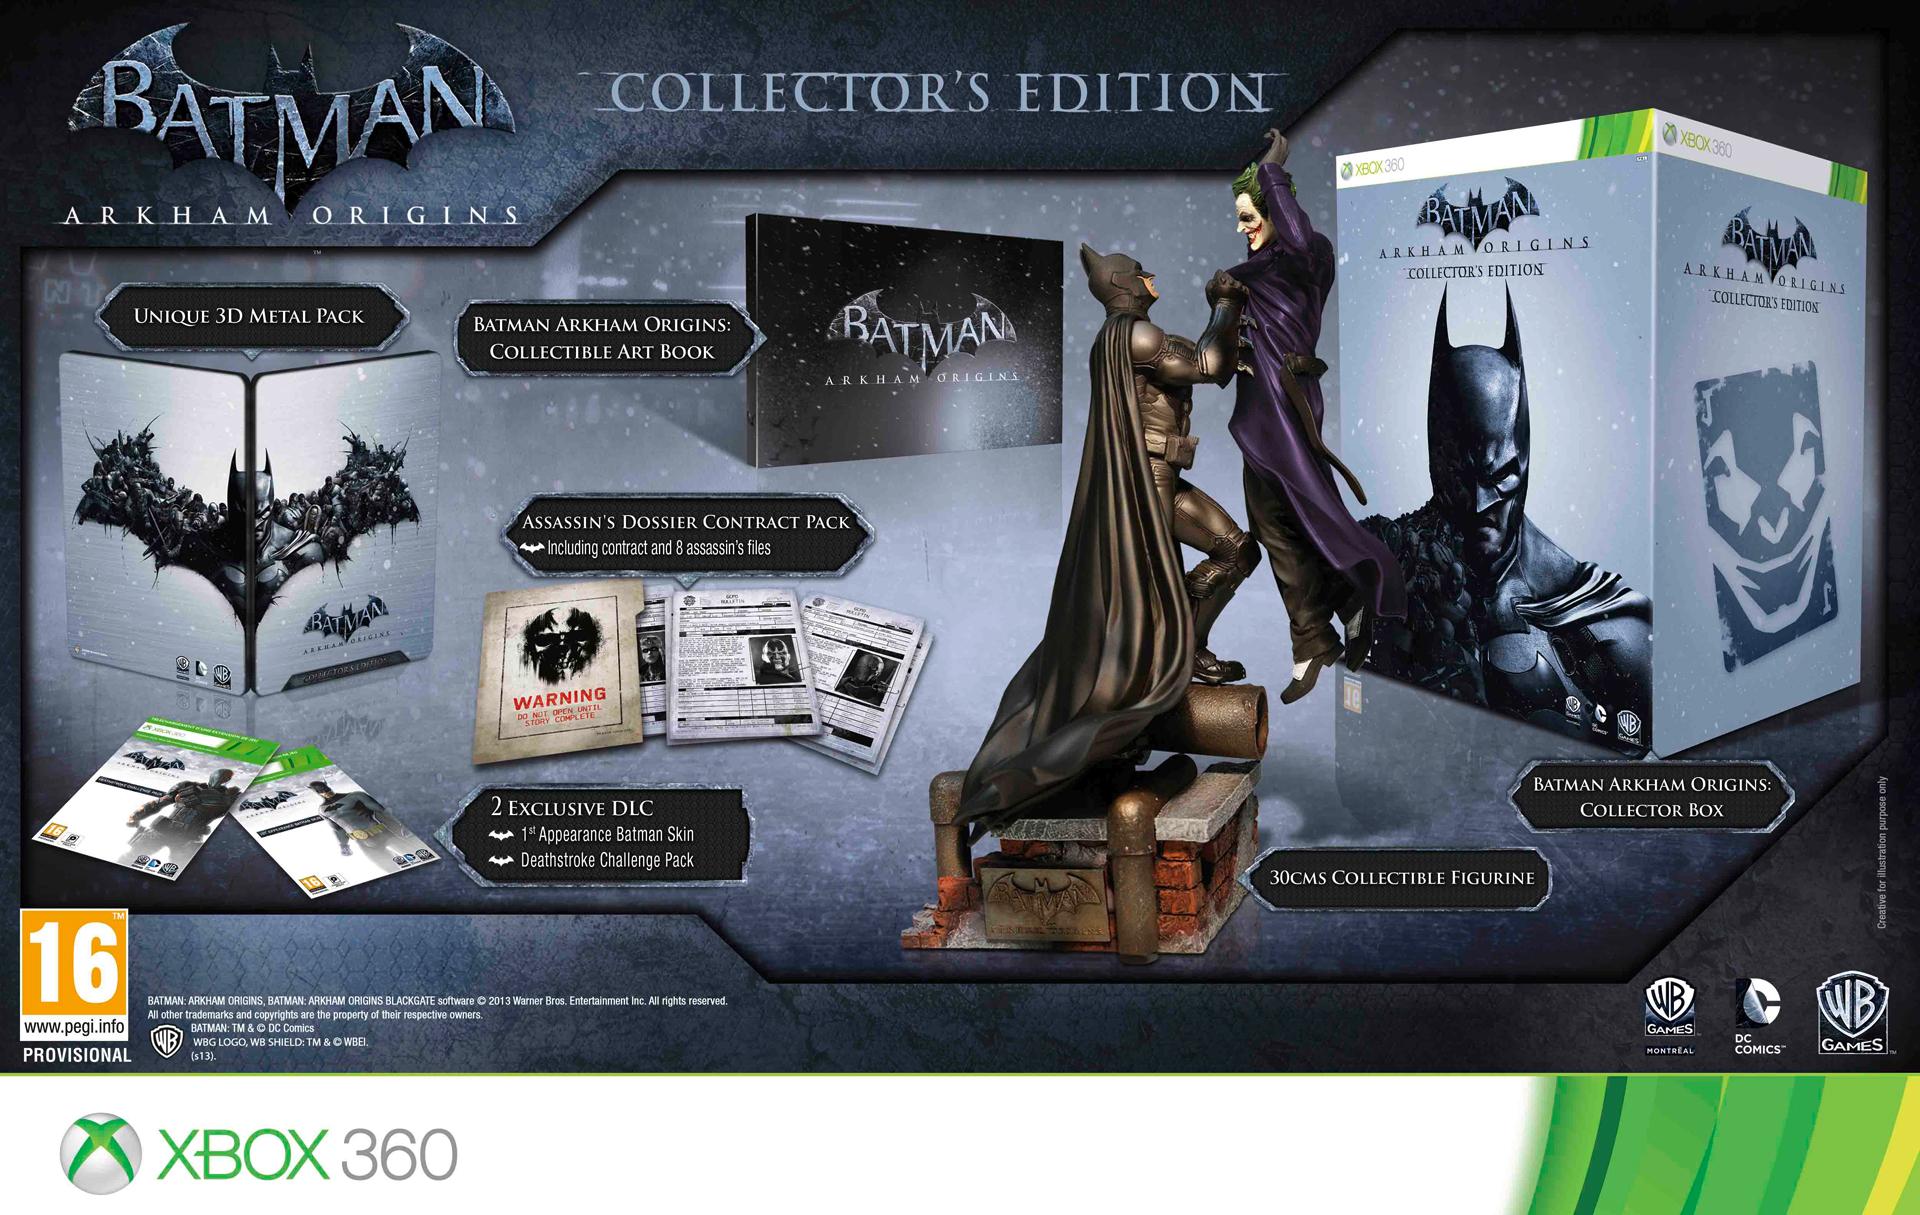 Batman  Arkham Origins Collector s Edition includes 30cm statue 9febe516b41